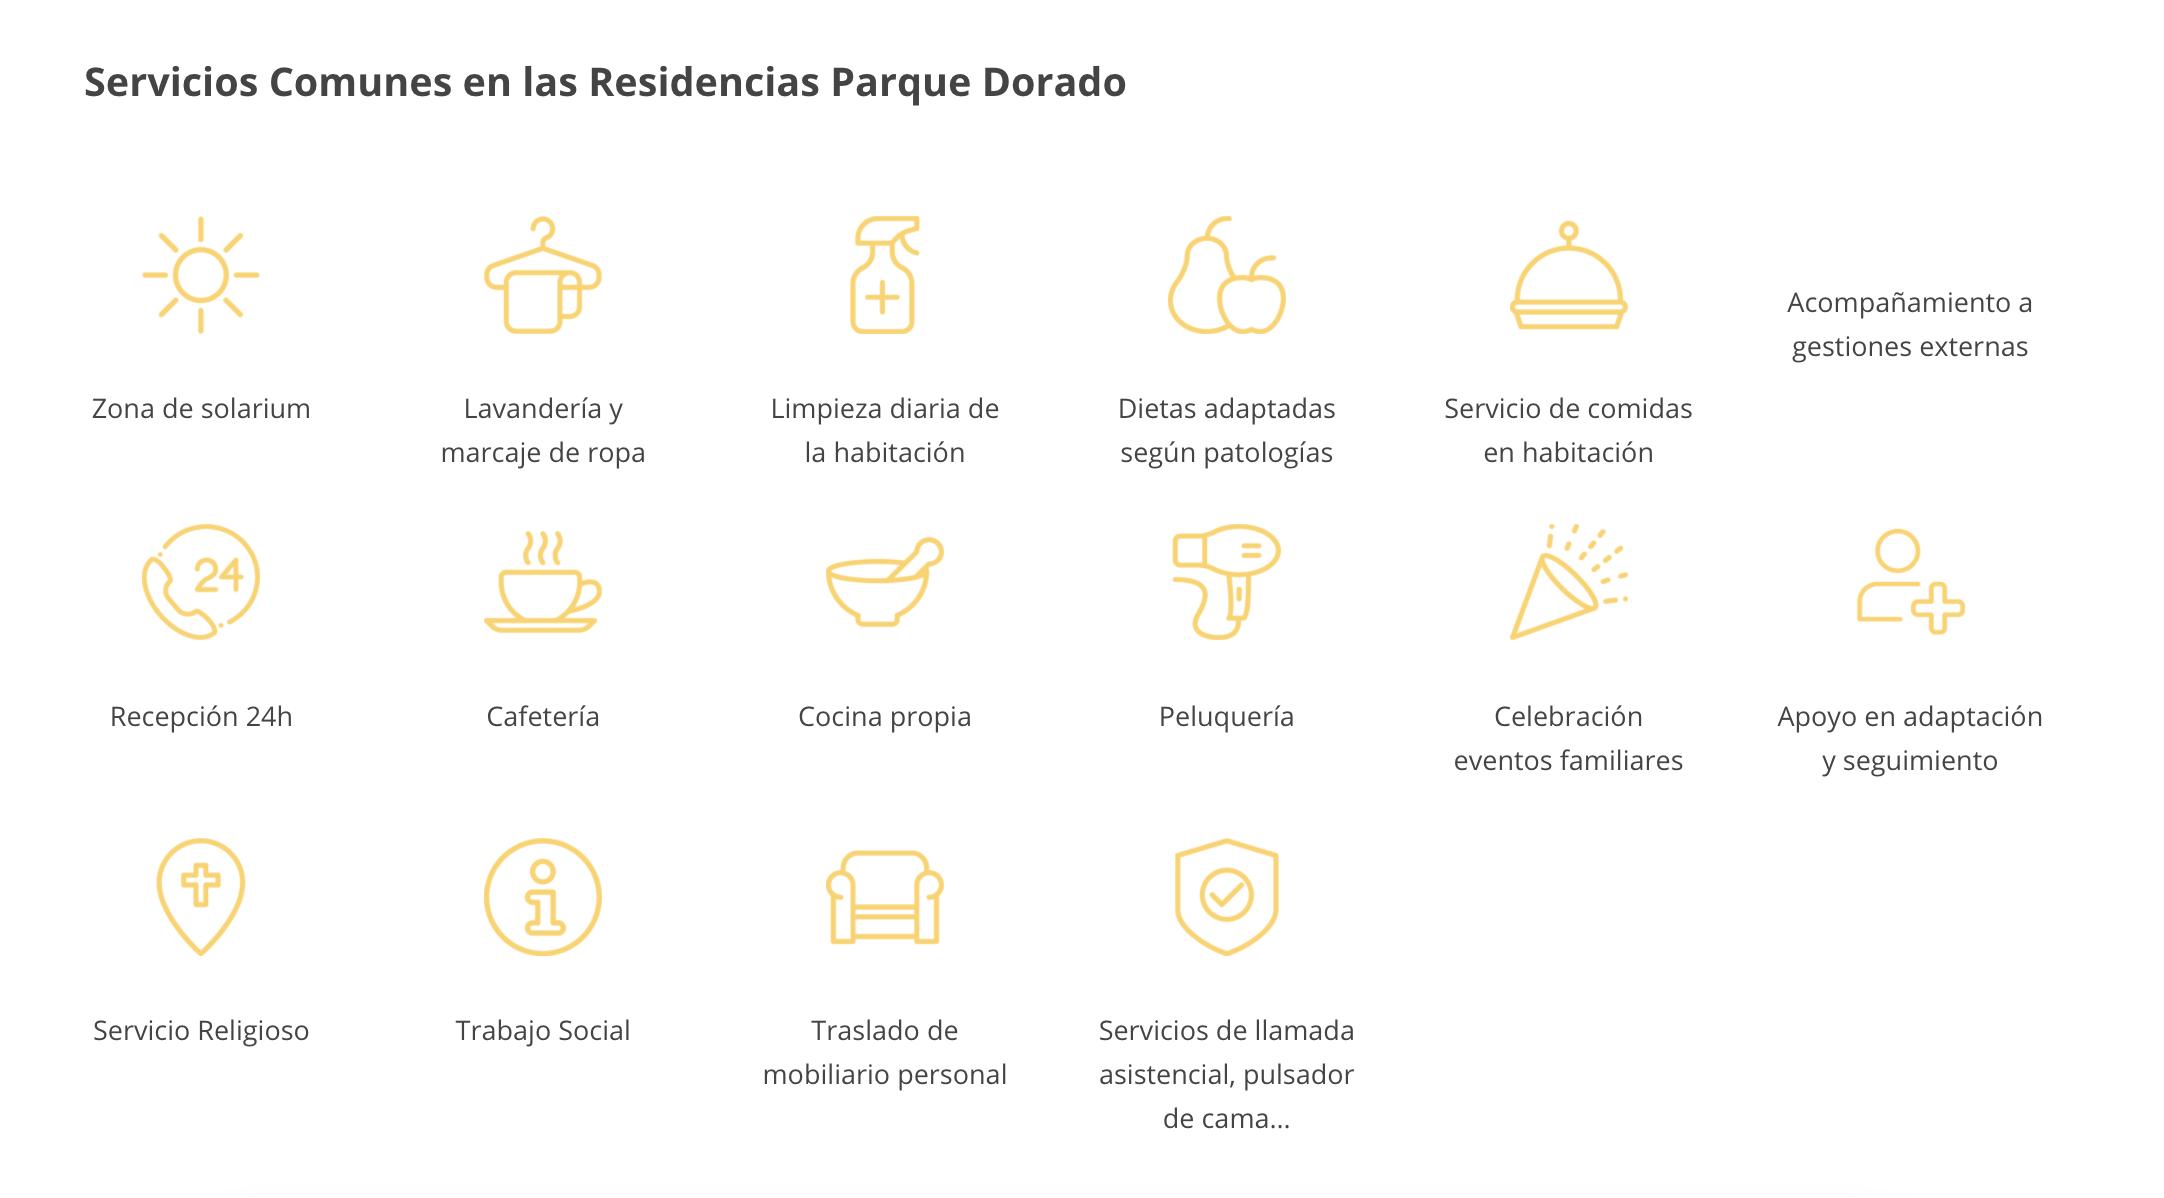 Servicios Comunes Residencias Parque Dorado